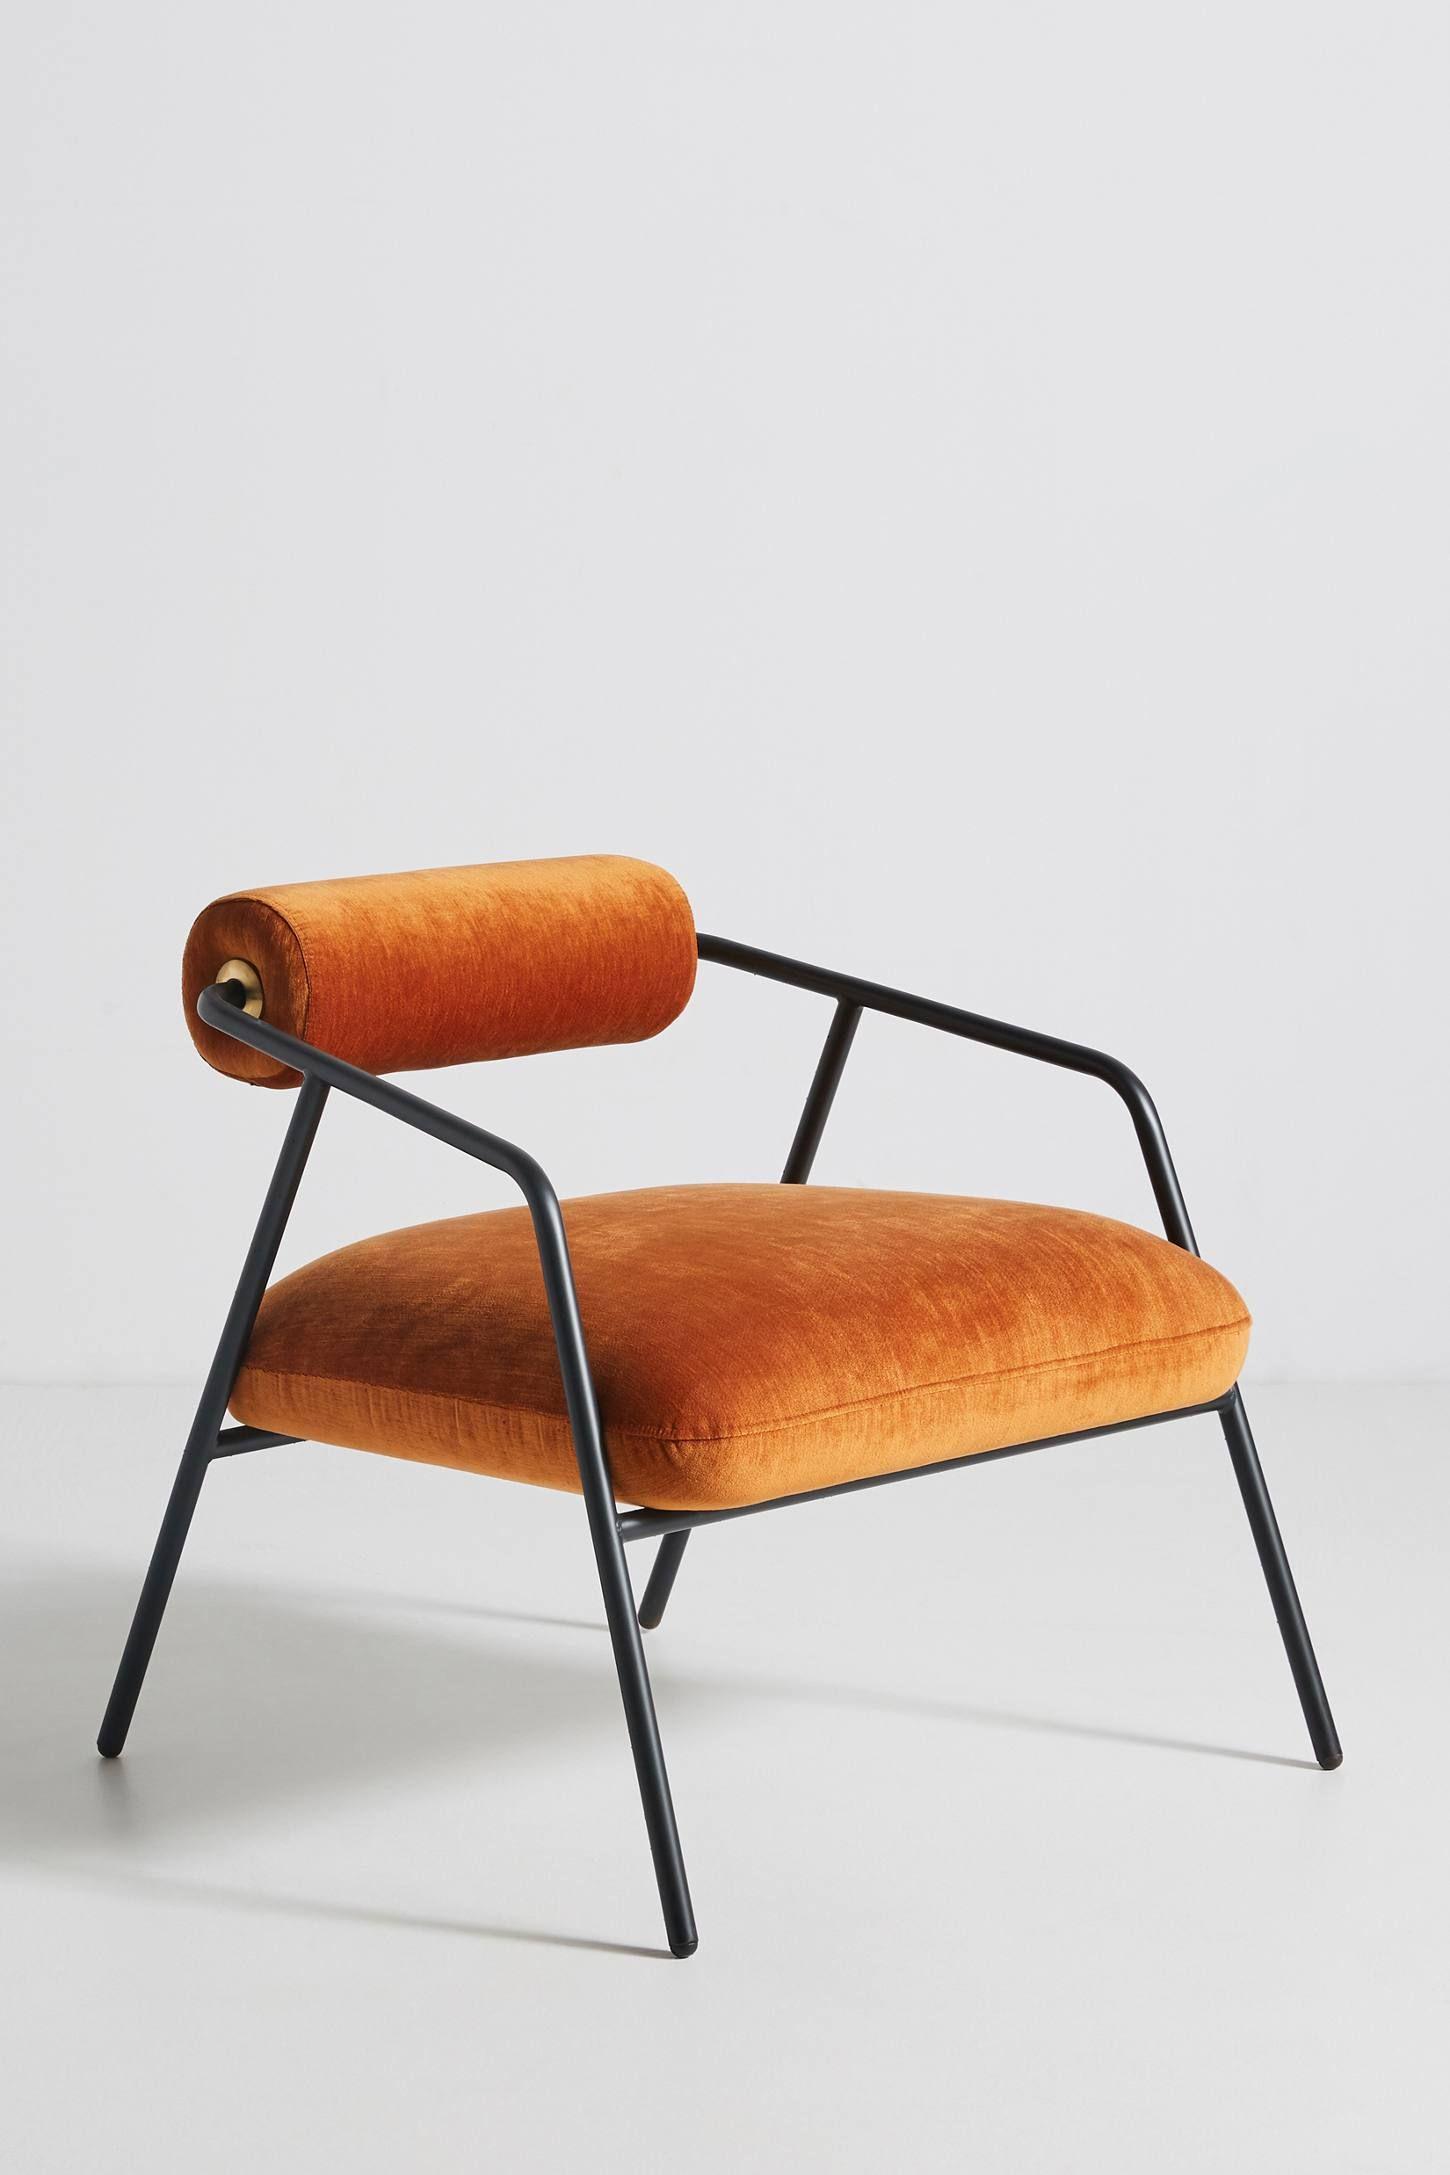 Amazing Cyrus Chair In 2019 Modern Chairs Unique Furniture Chair Creativecarmelina Interior Chair Design Creativecarmelinacom